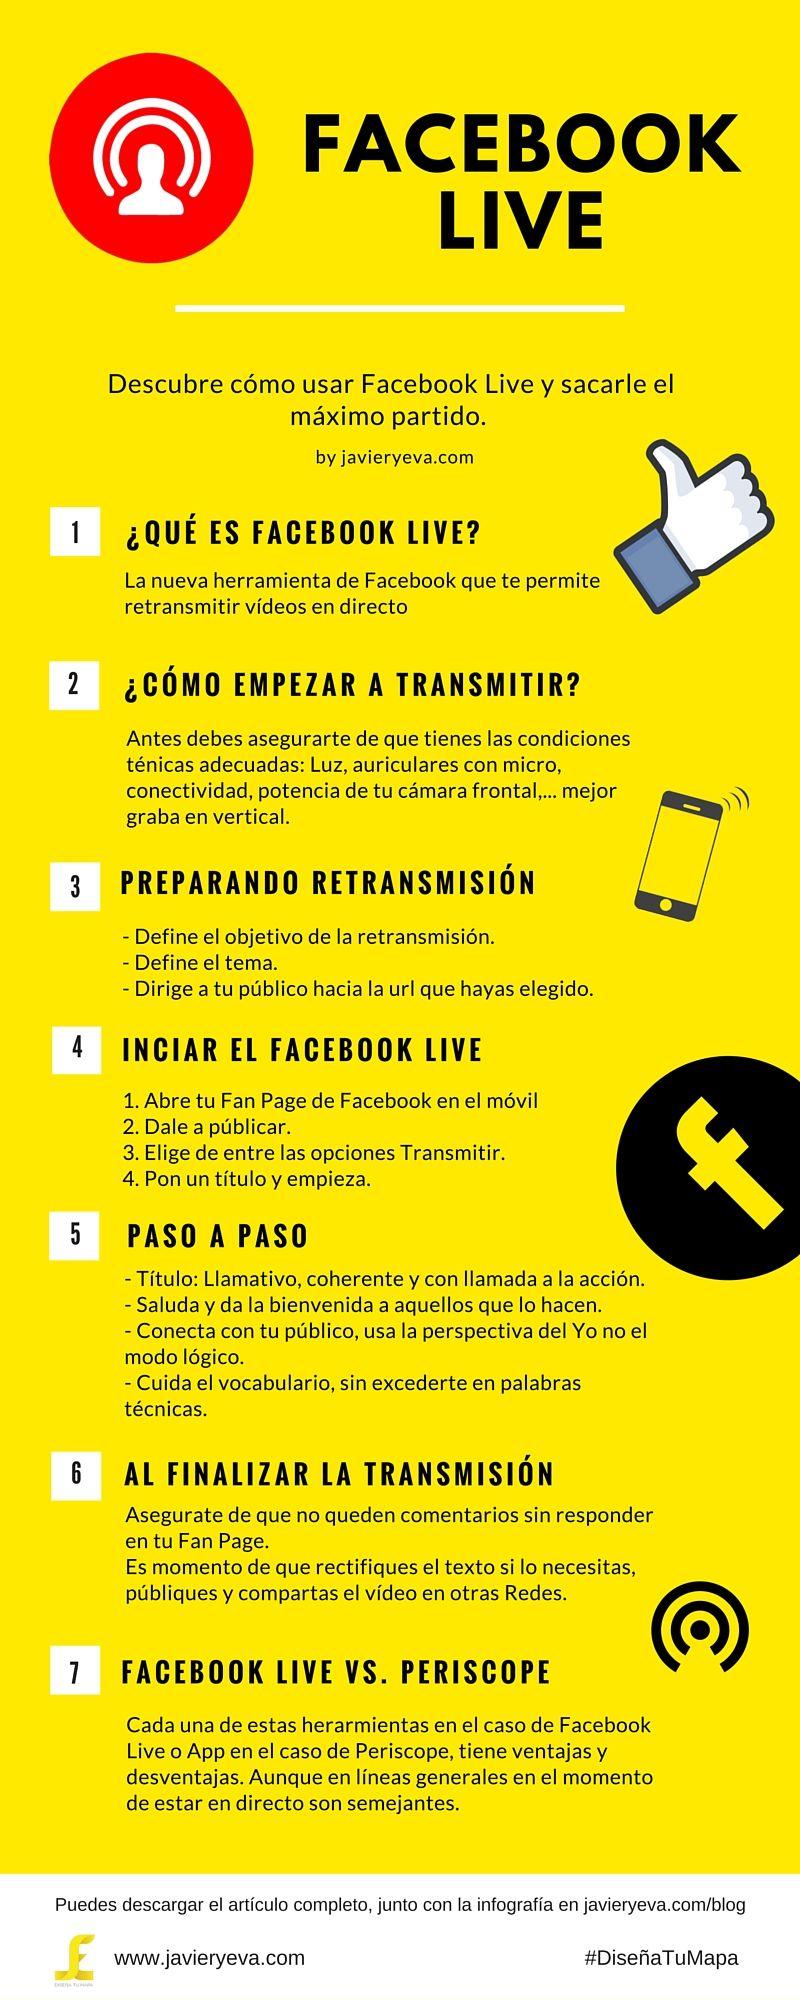 Facebook Live: cómo sacarle el máximo partido #infografia #infographic #socialmedia